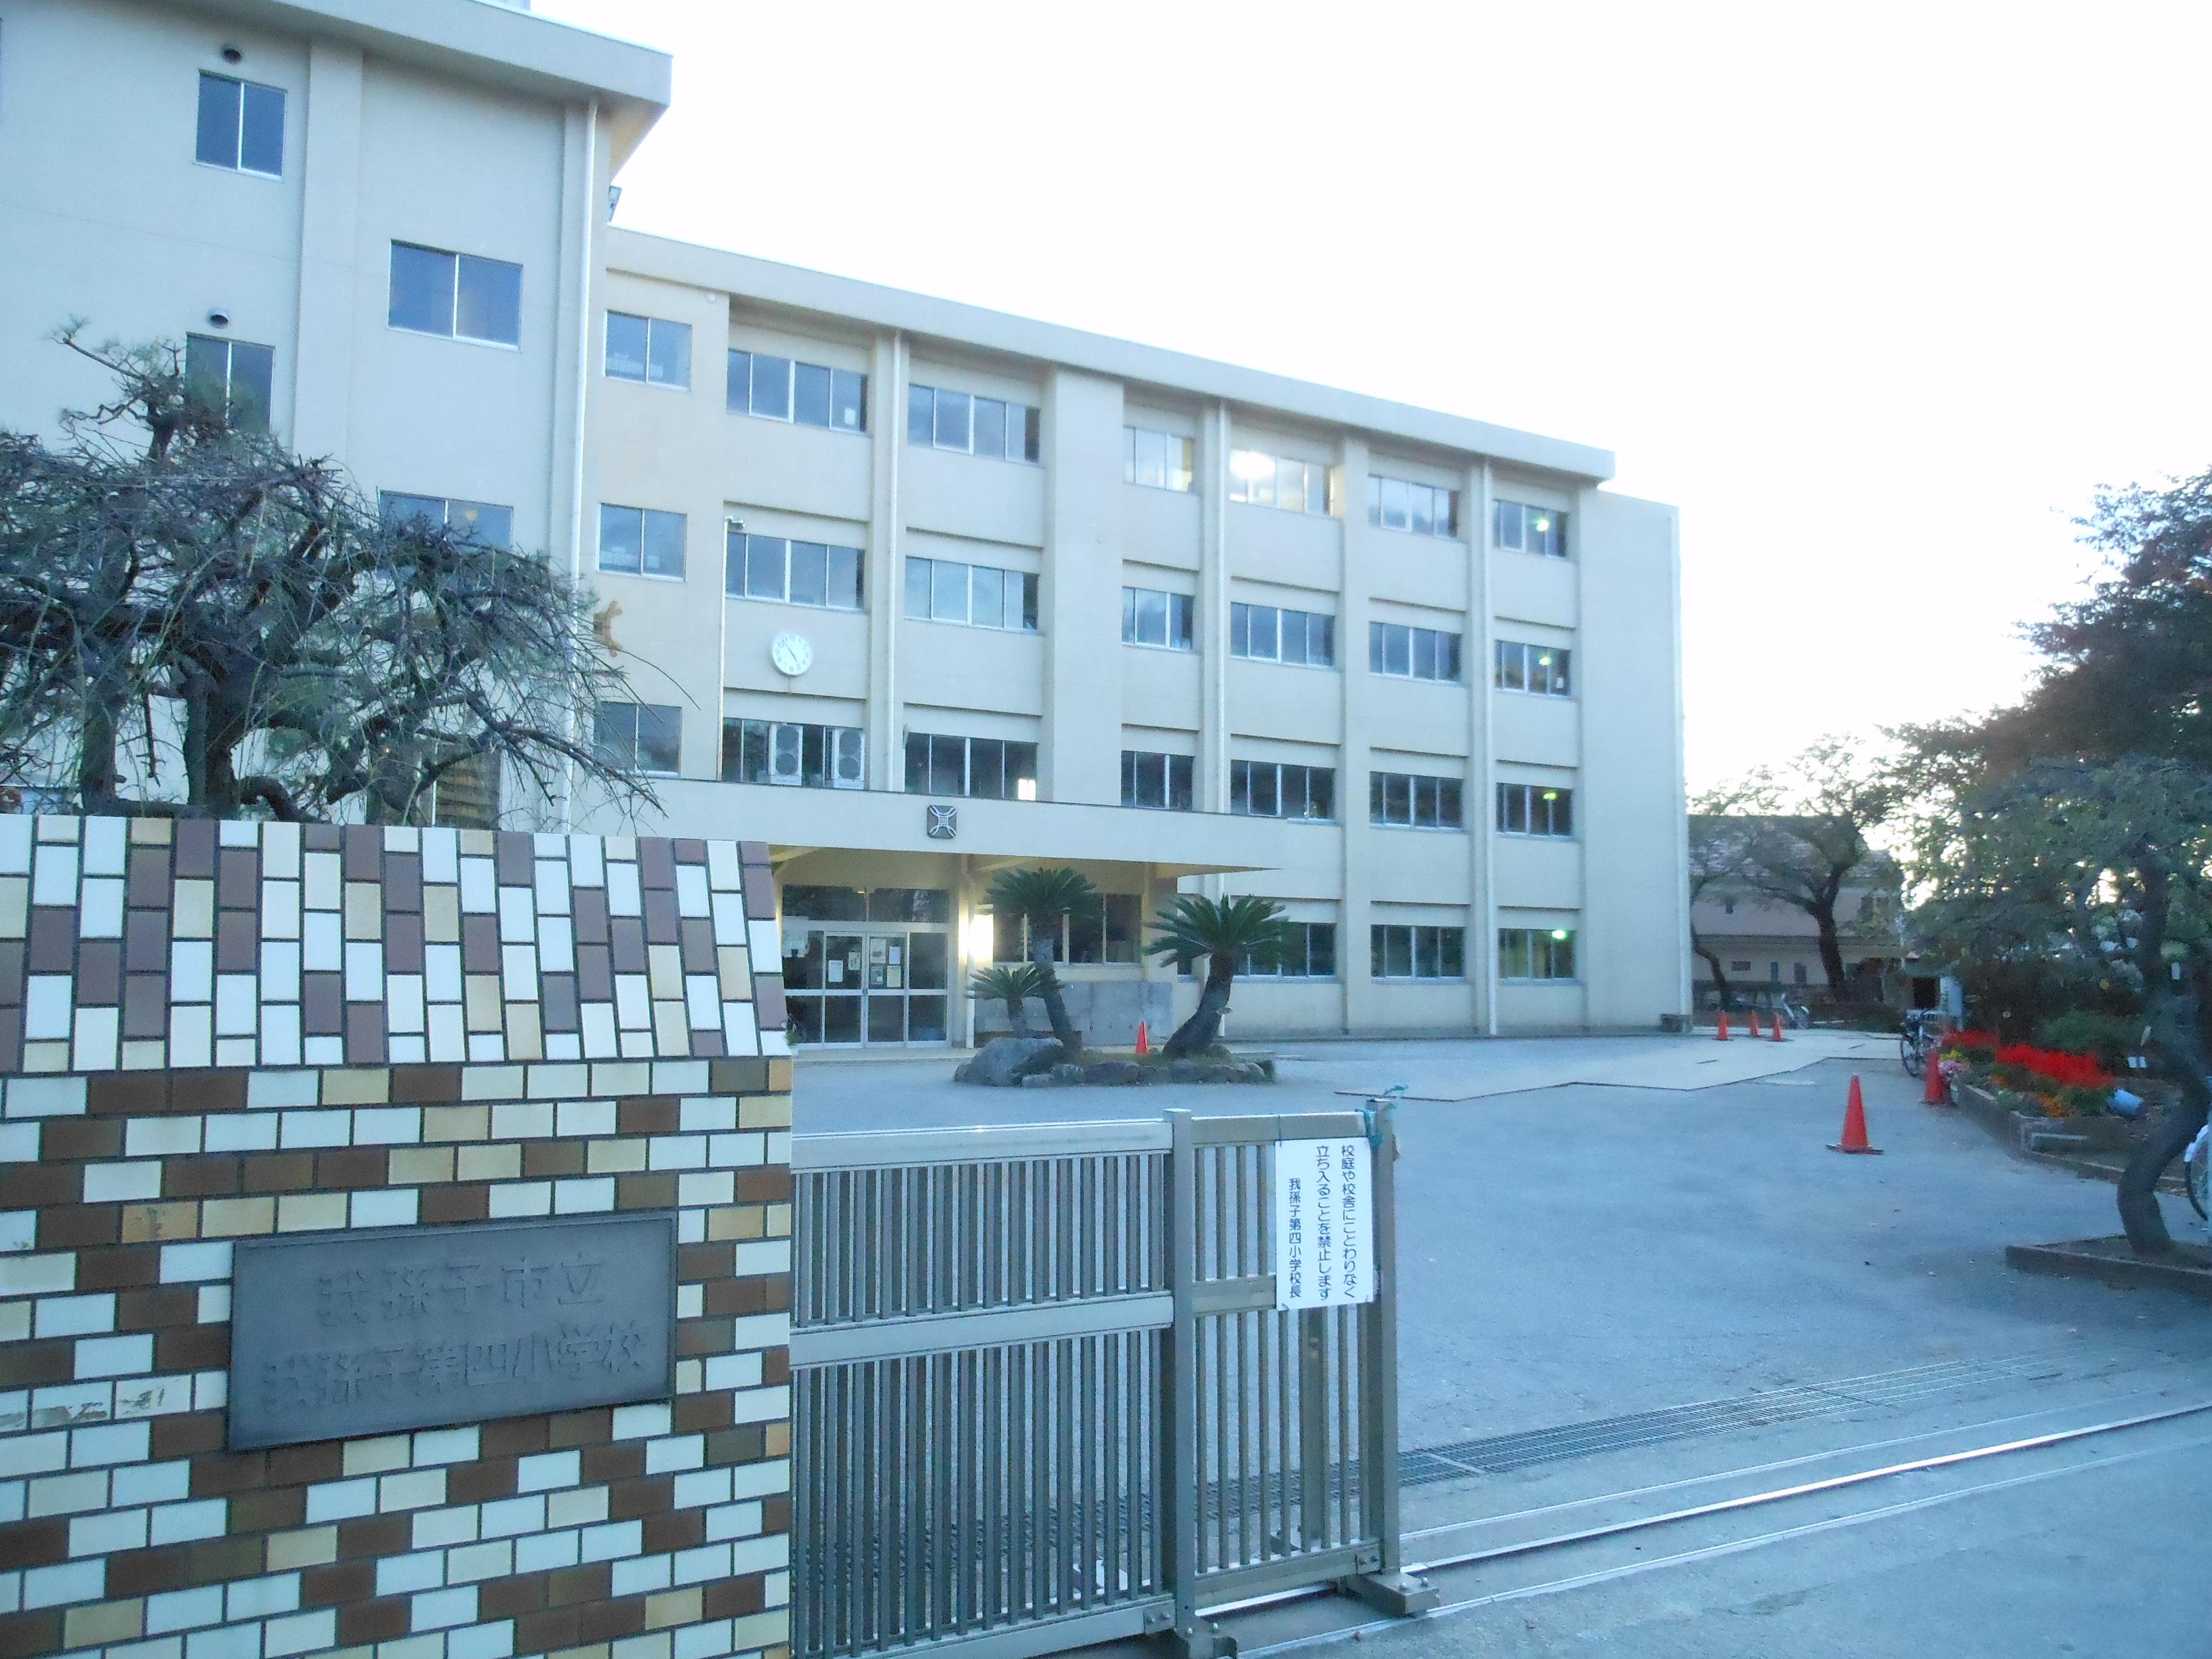 File Abiko City Abiko Forth Elementary School Jpg Wikimedia Commons